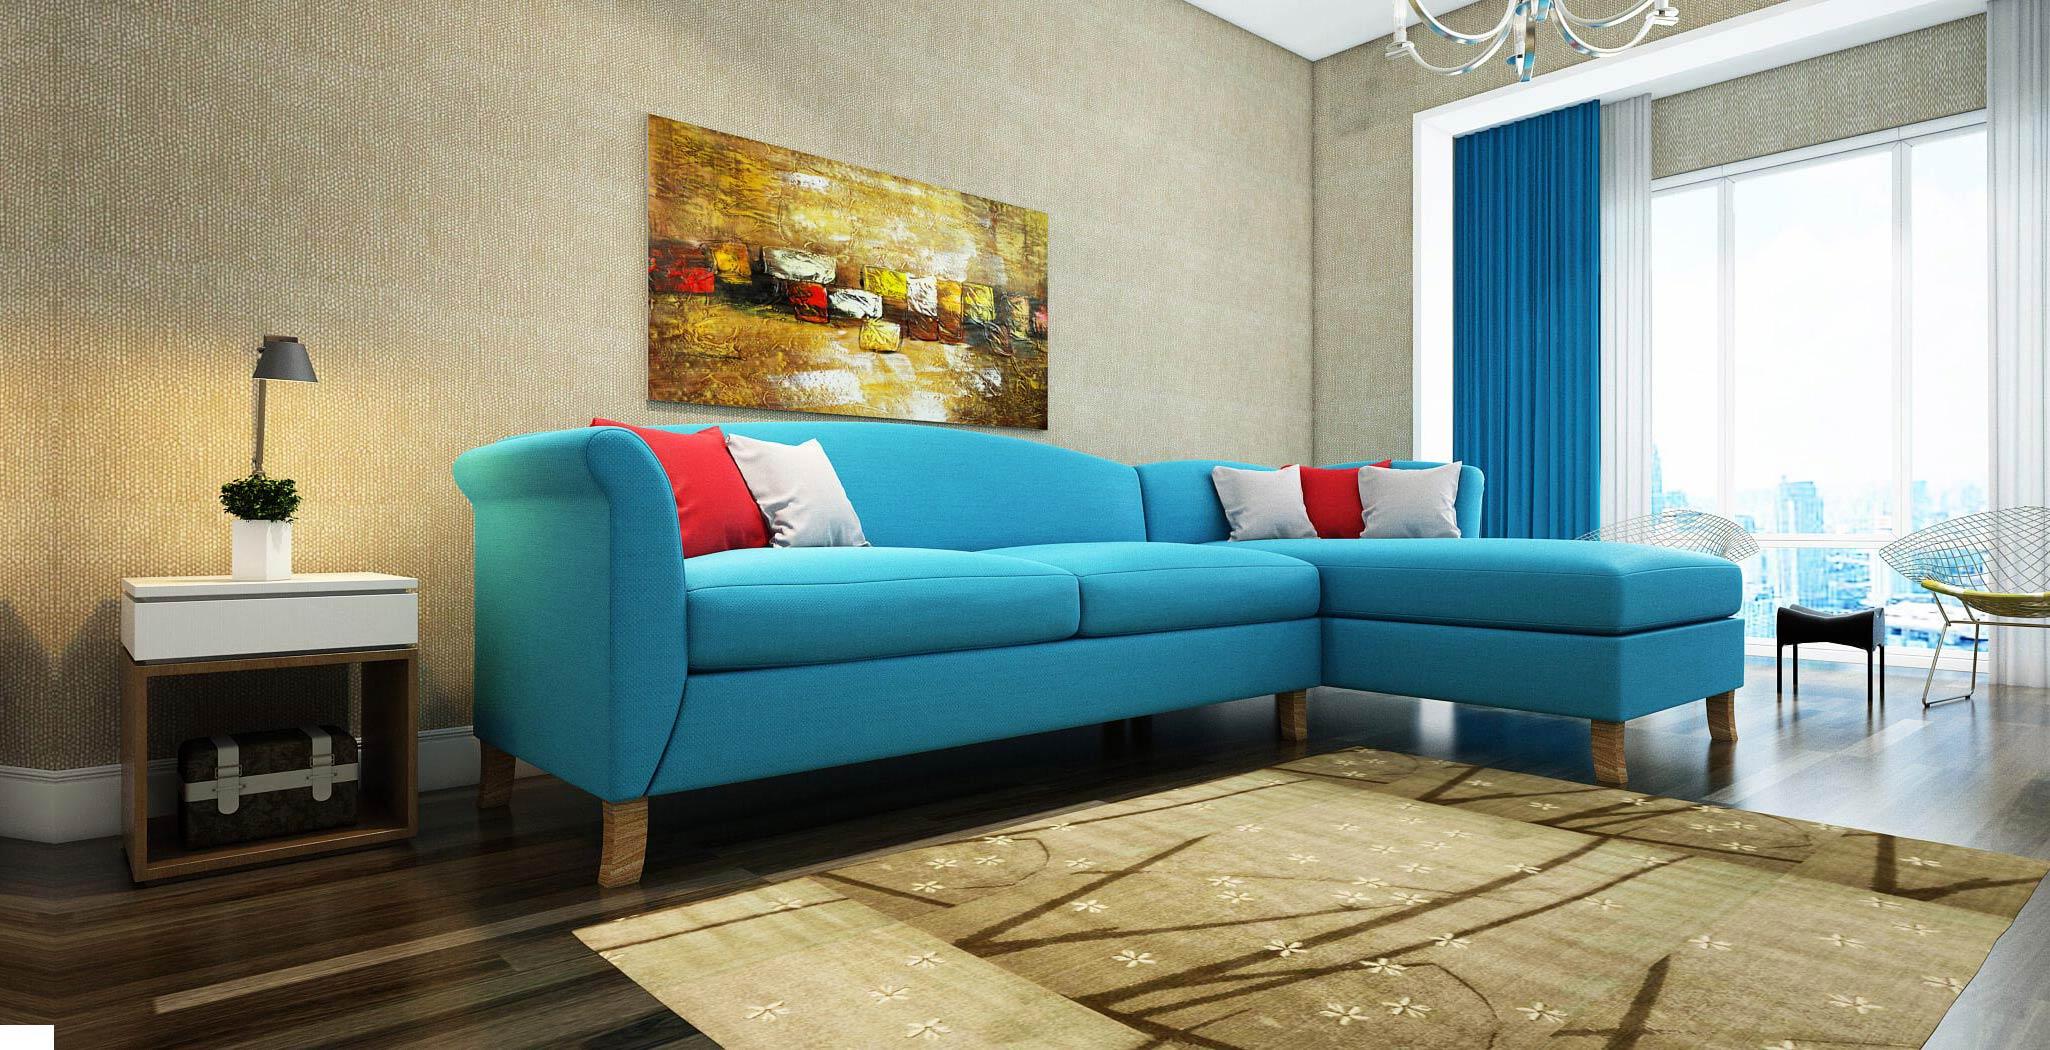 crete panel furniture gallery 5